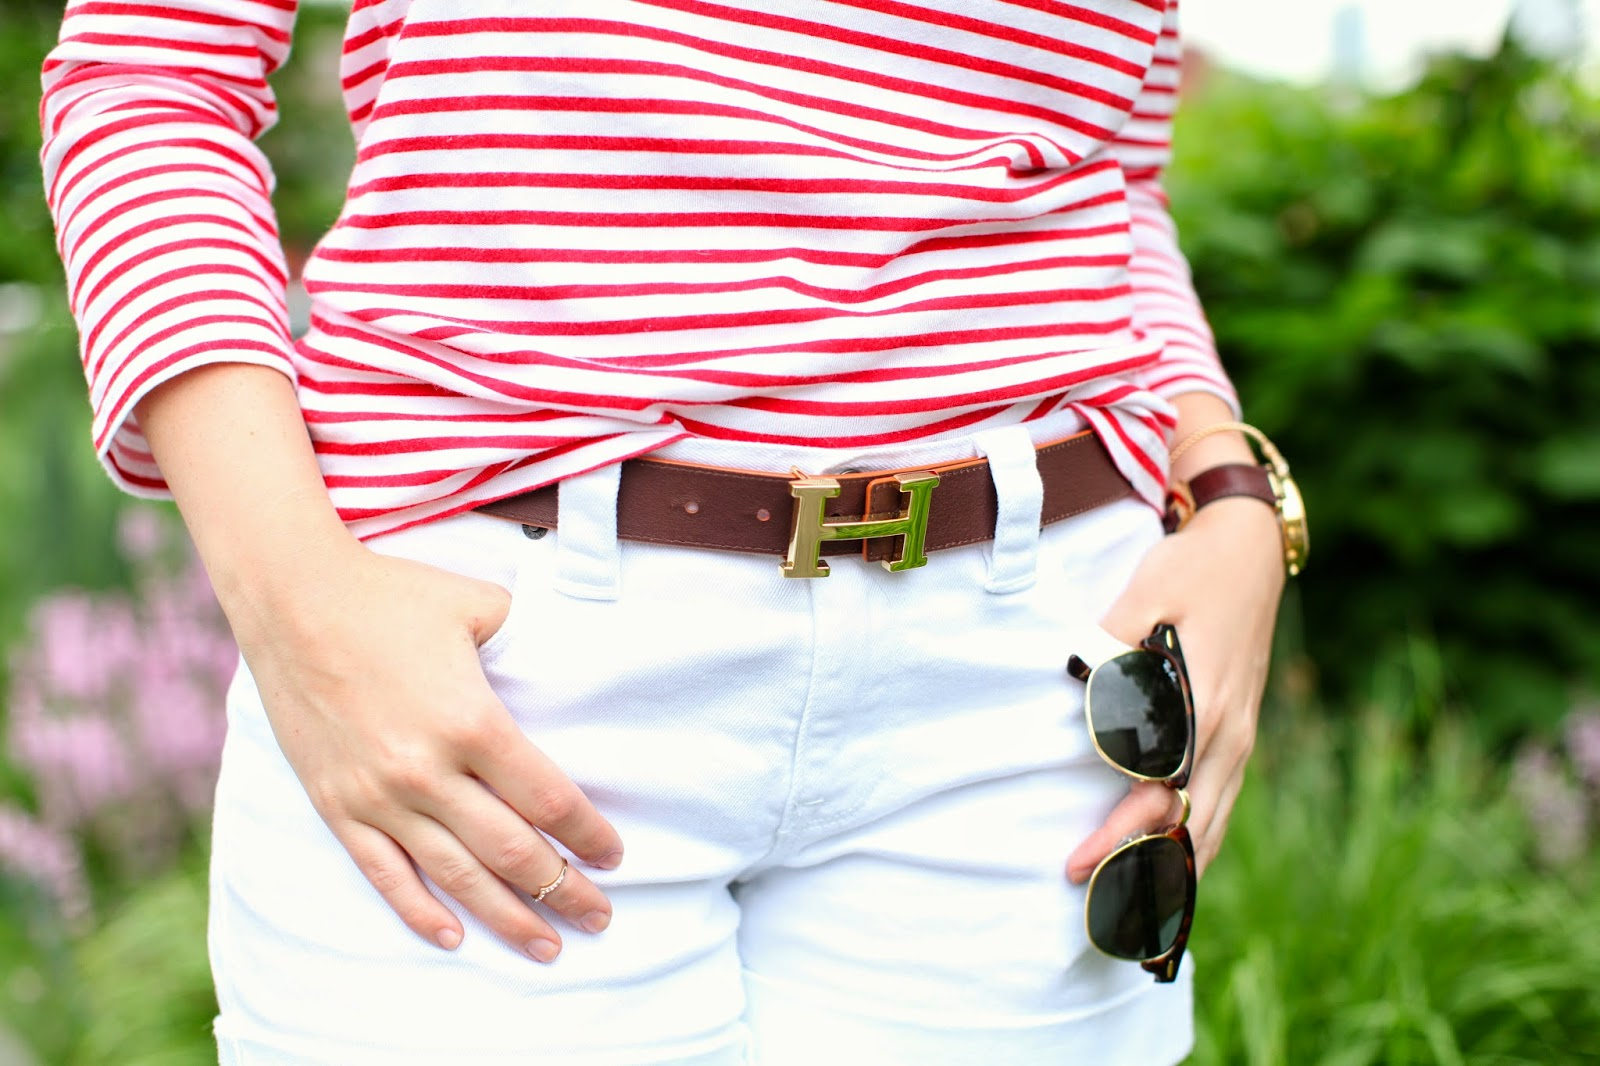 cheap hermes belt, cwonder belt, preppy belt